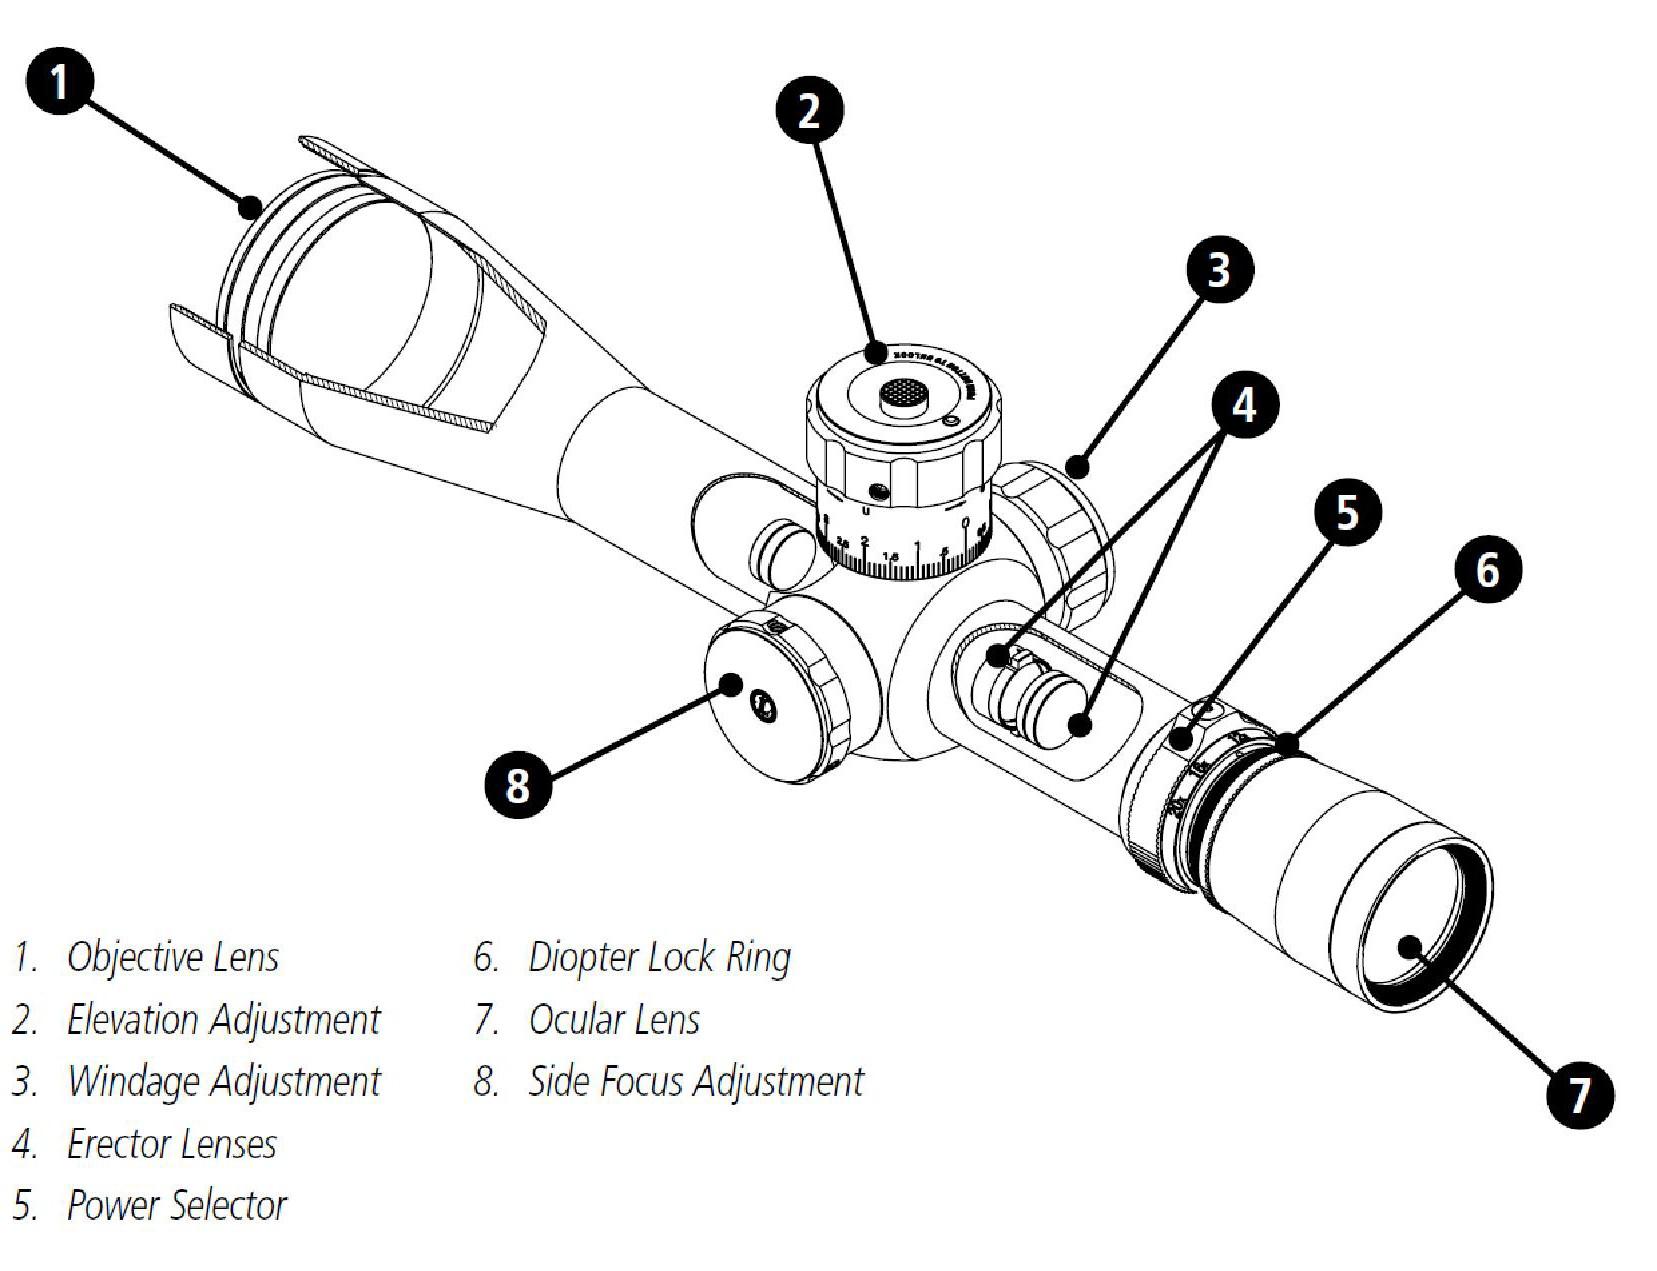 bushnell rifle scope parts diagram